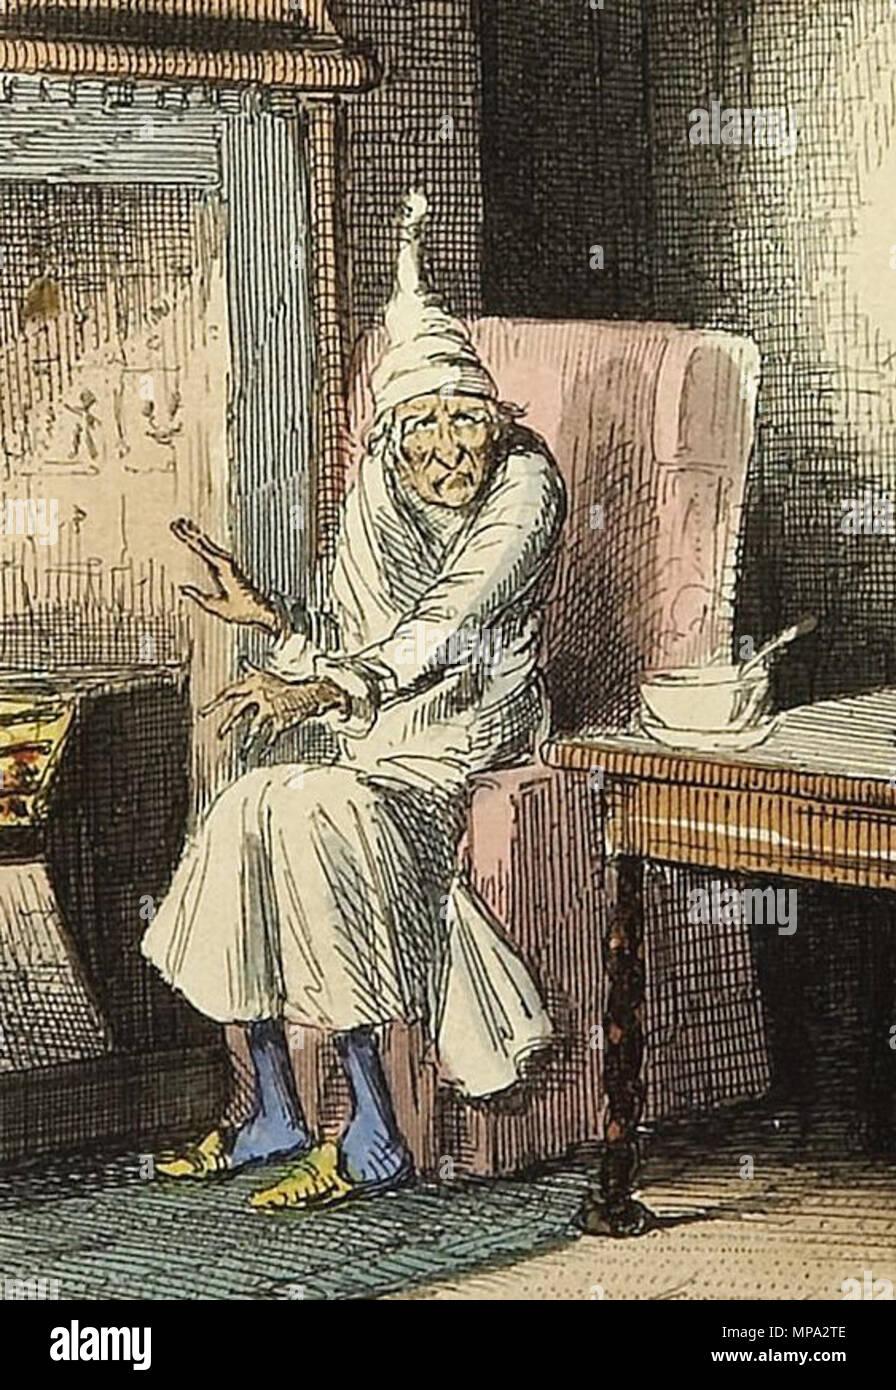 Scrooge aus Charles Dickens: A Christmas Carol. In der Prosa. Ein ...